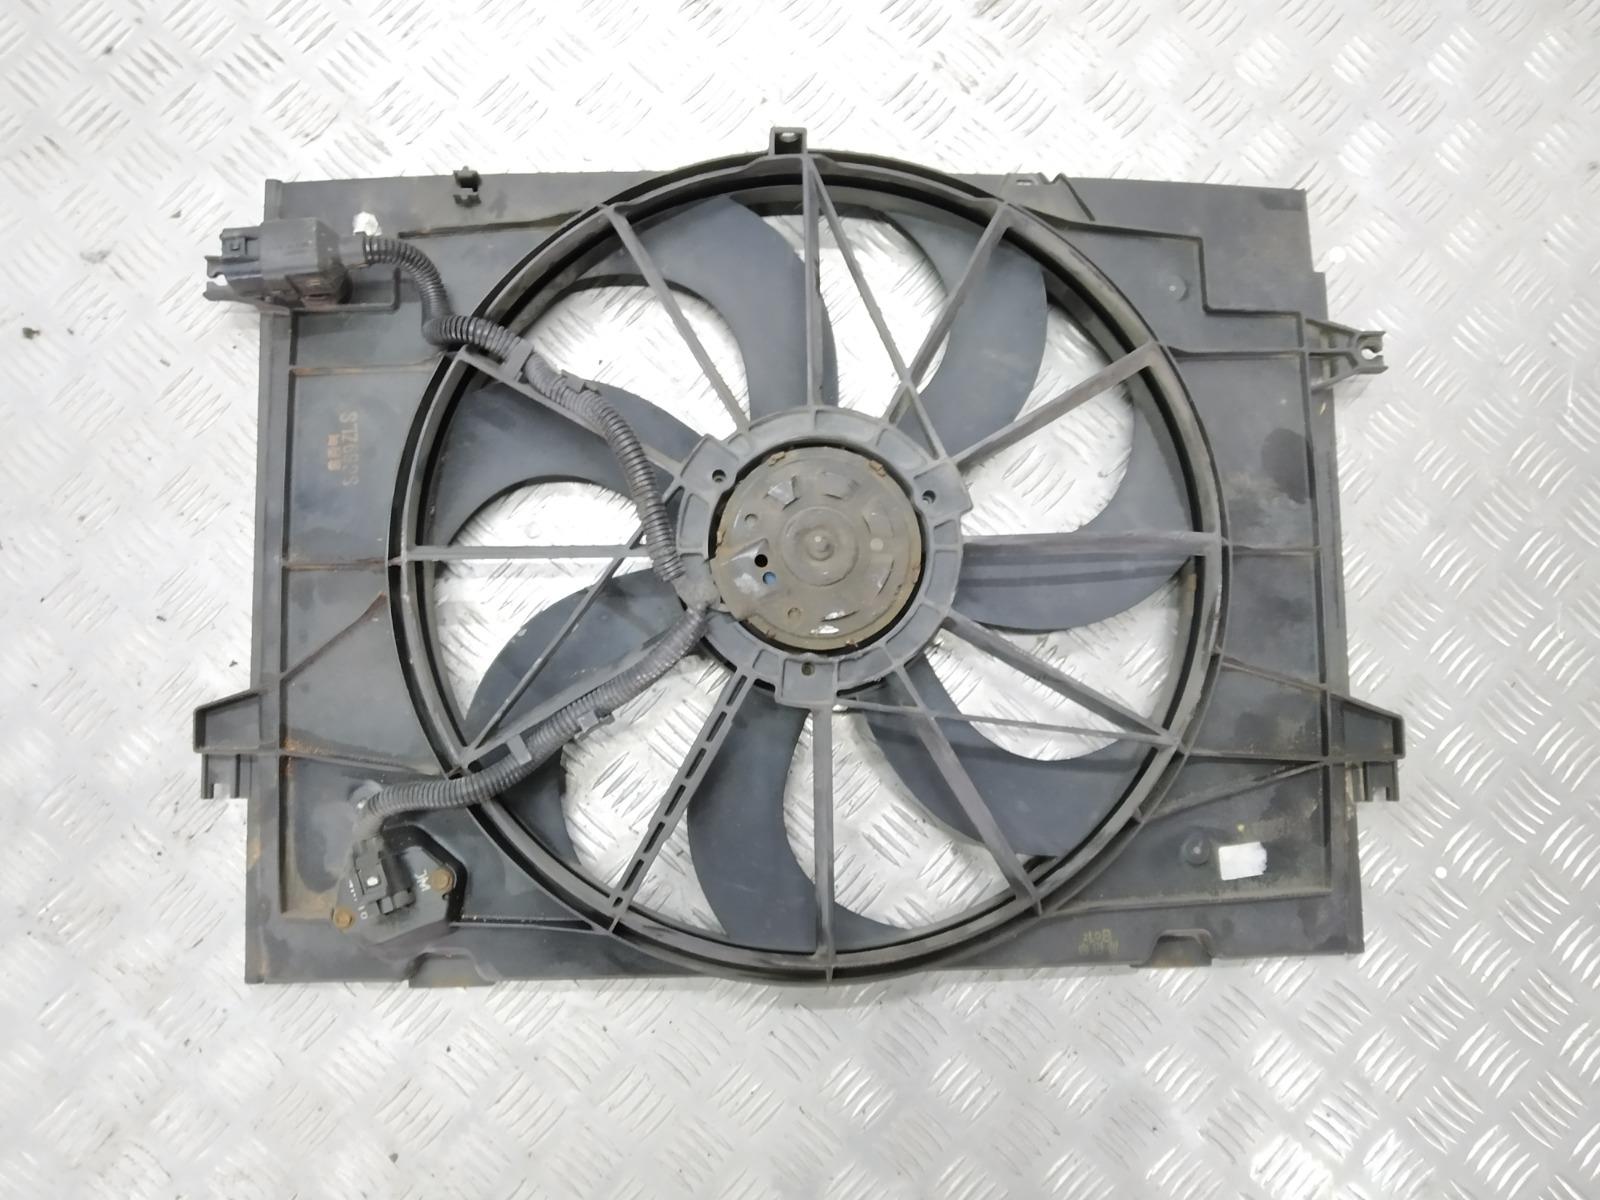 Вентилятор радиатора Hyundai Tucson 2.0 CRDI 2005 (б/у)